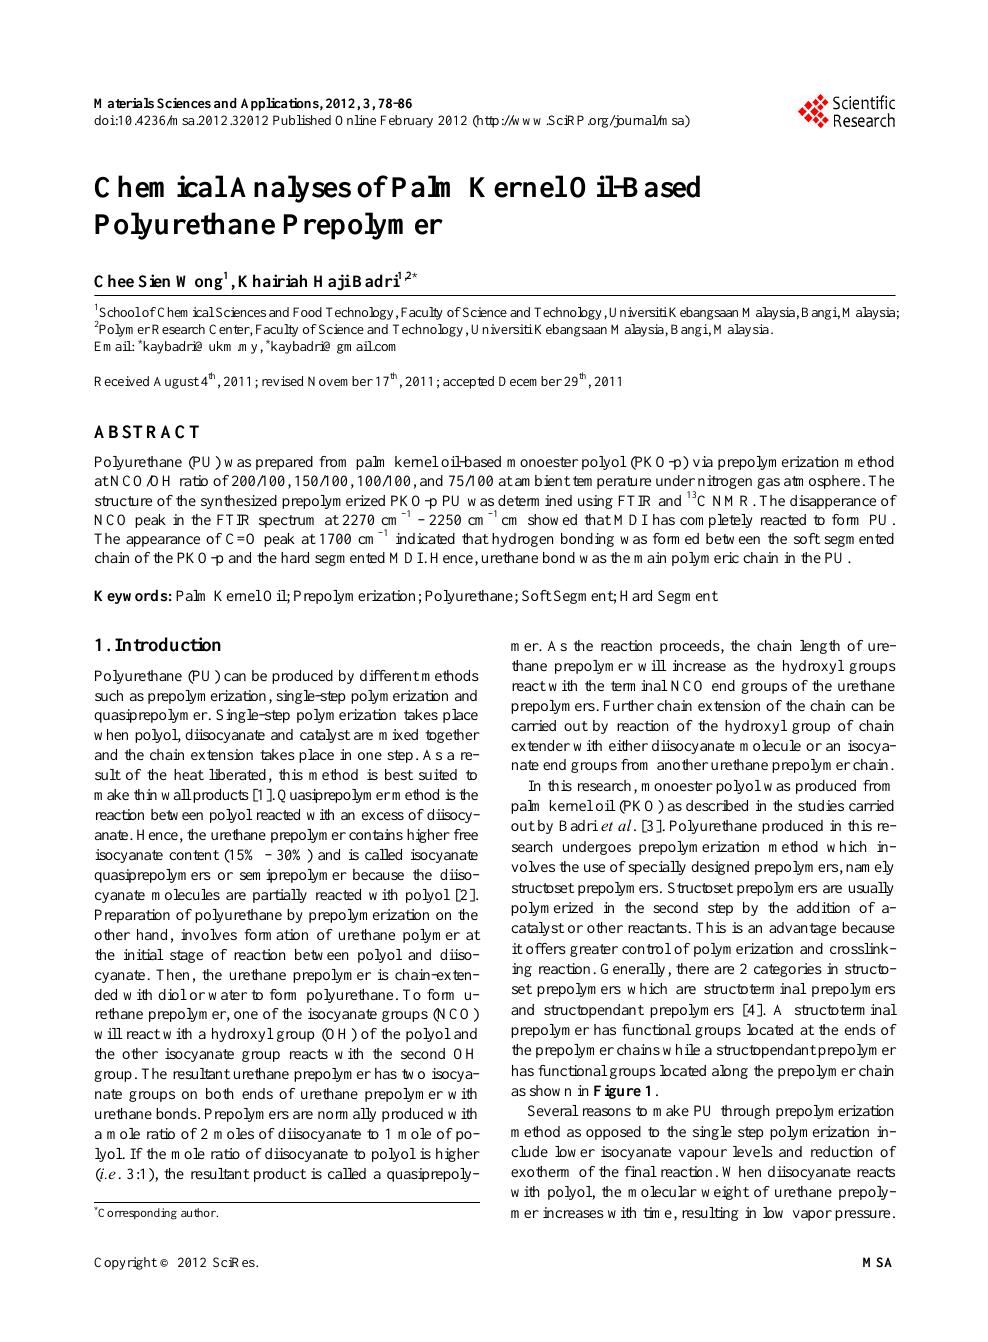 Chemical Analyses of Palm Kernel Oil-Based Polyurethane Prepolymer